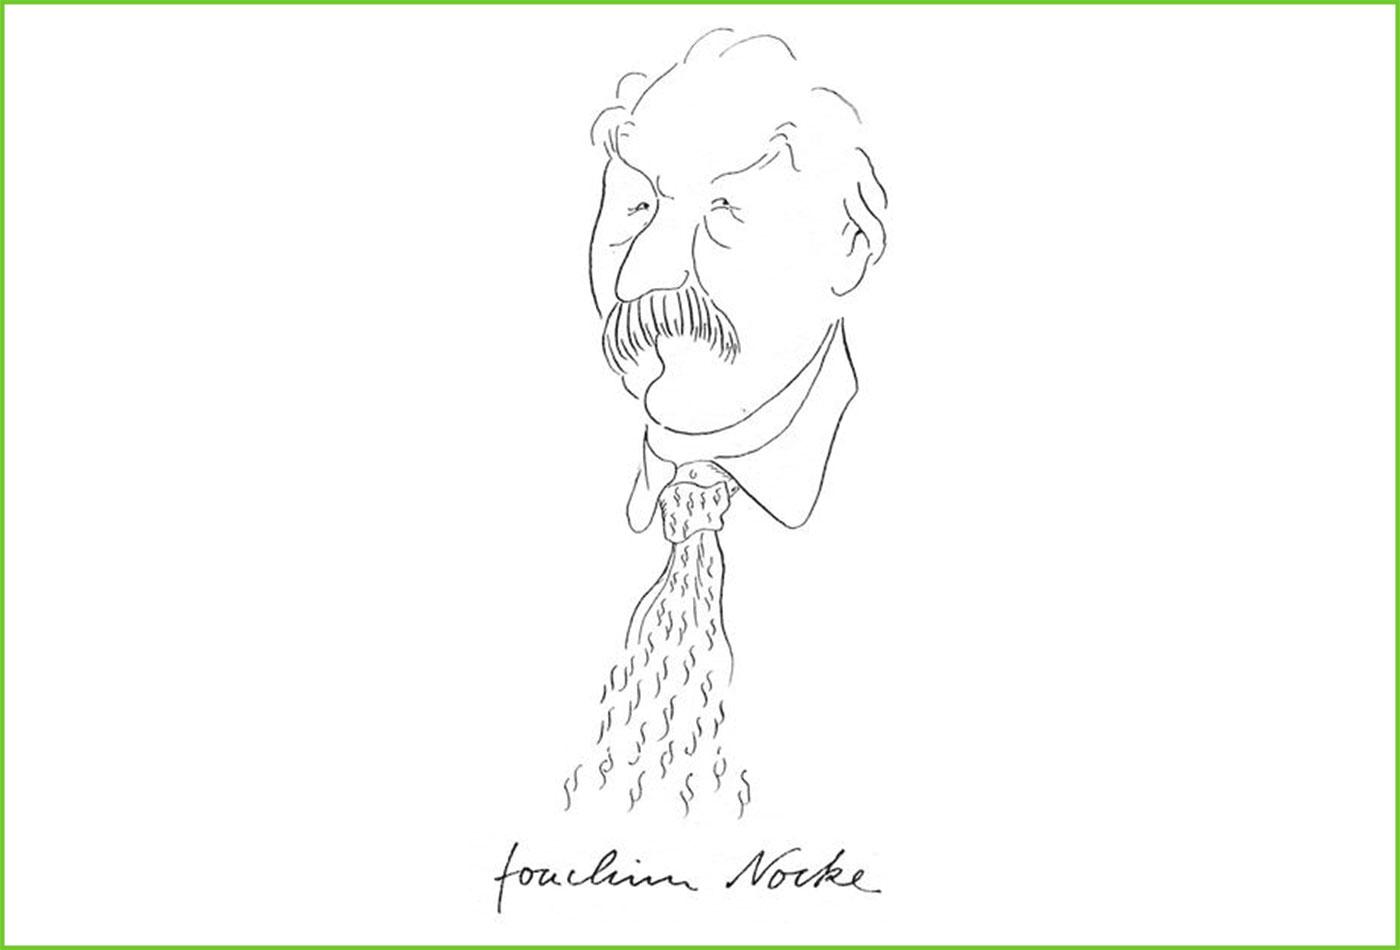 Joachim Nocke